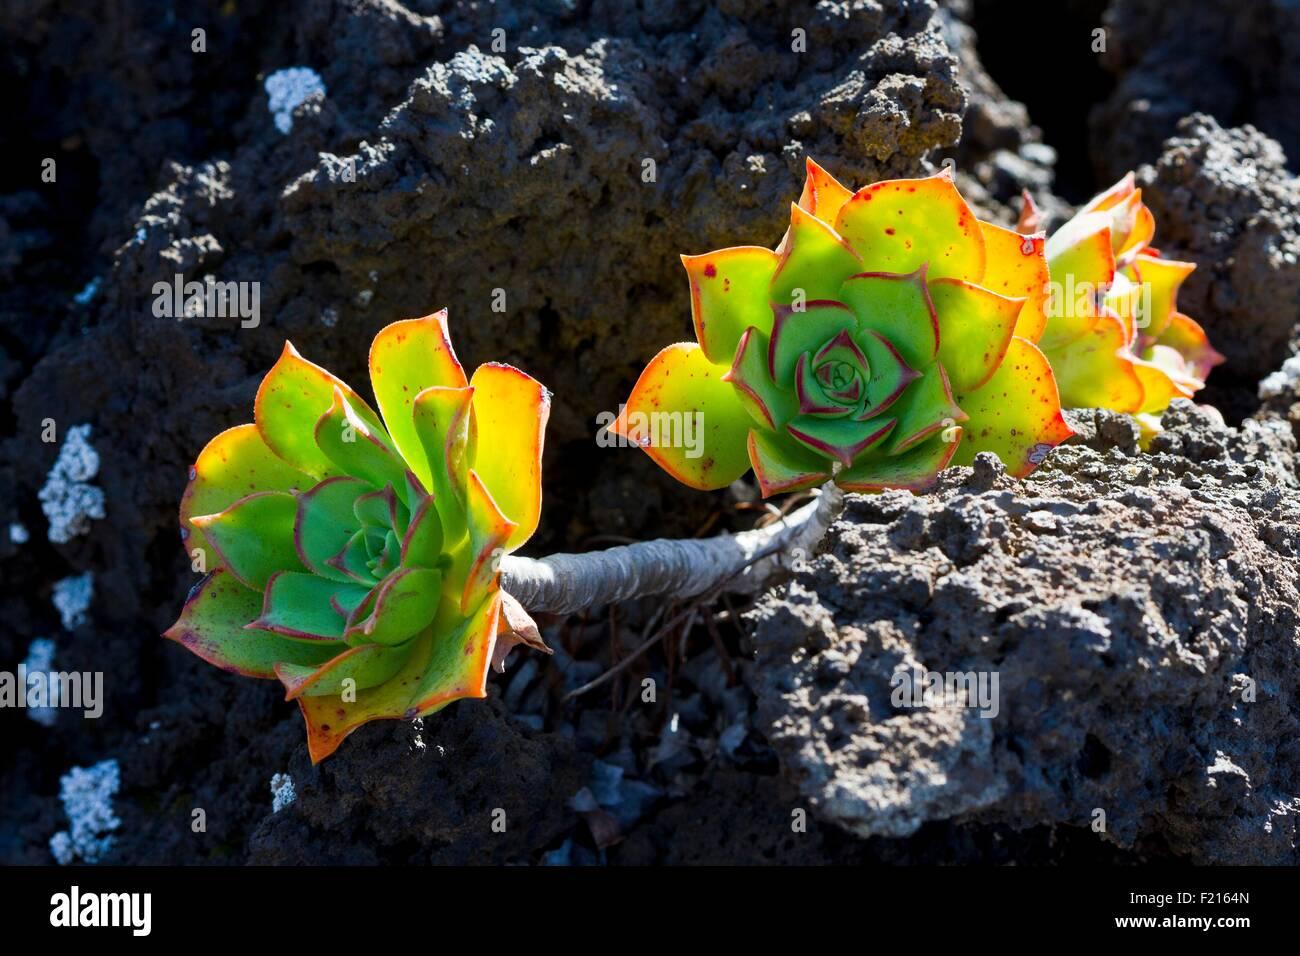 Spain, Canaries Islands, Lanzarote island, Aeonium Haworthii Kiwi in a field of lava - Stock Image